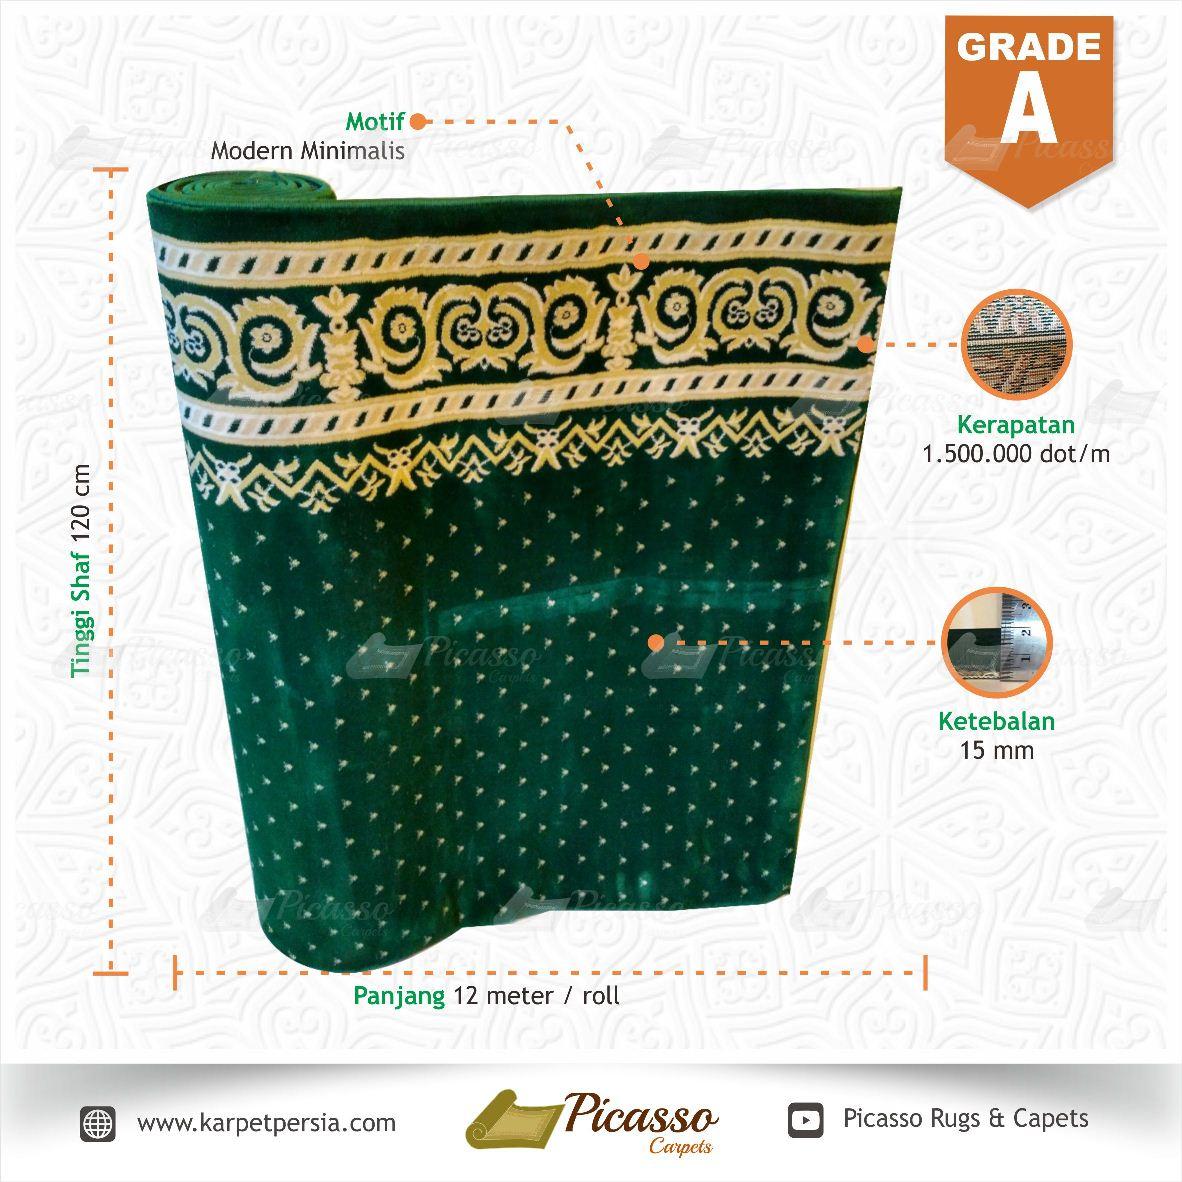 Karpet Masjid - Grade A